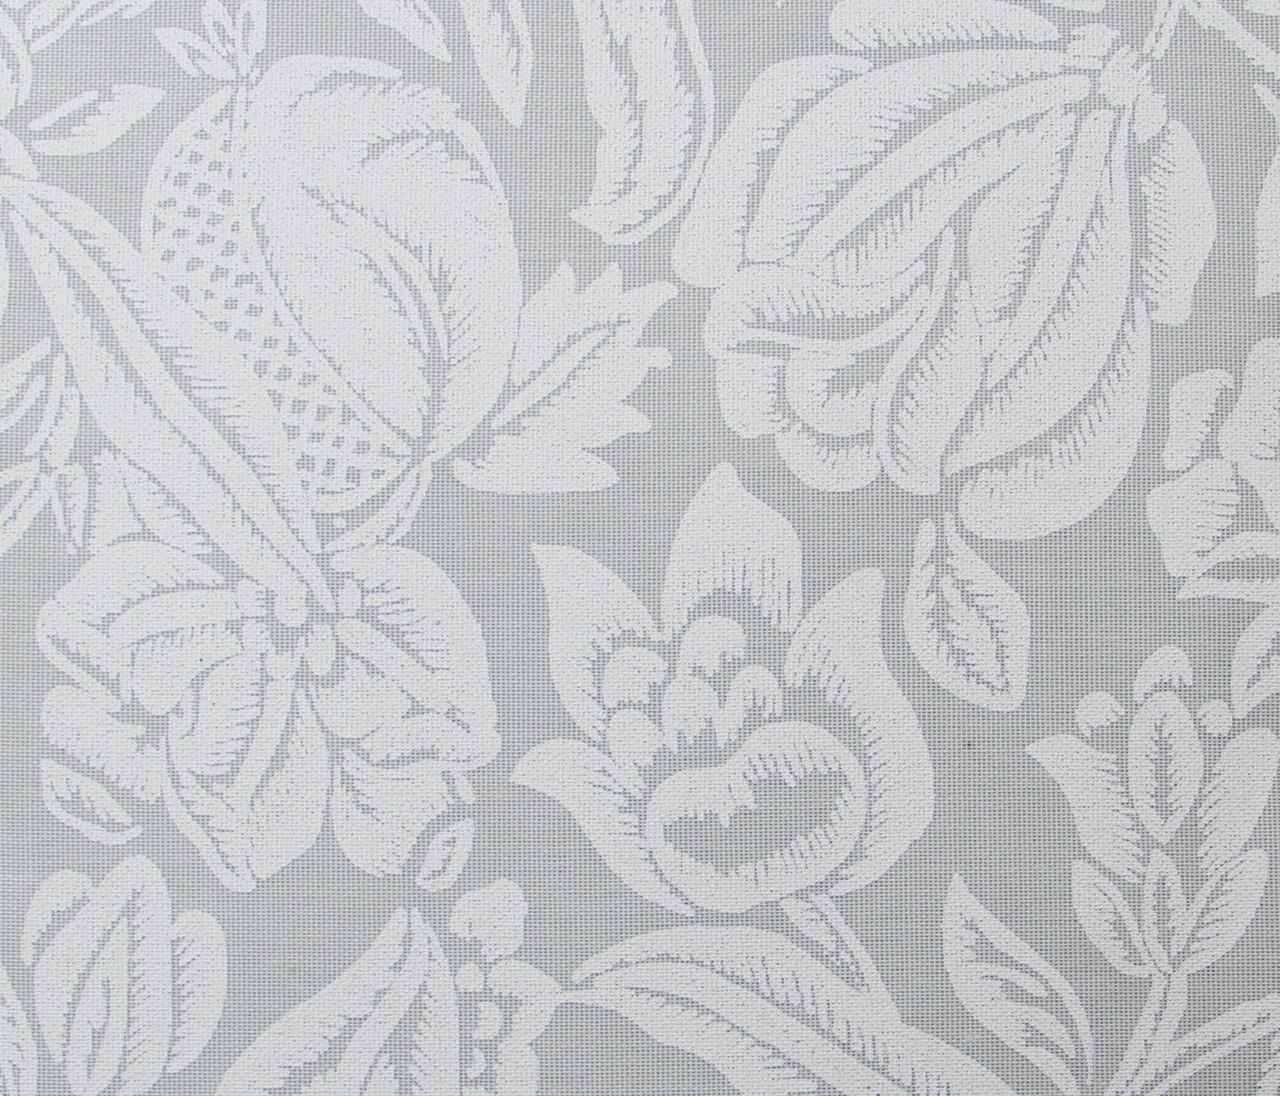 Готовые рулонные шторы Ткань Фантазия Белый 1250*1500